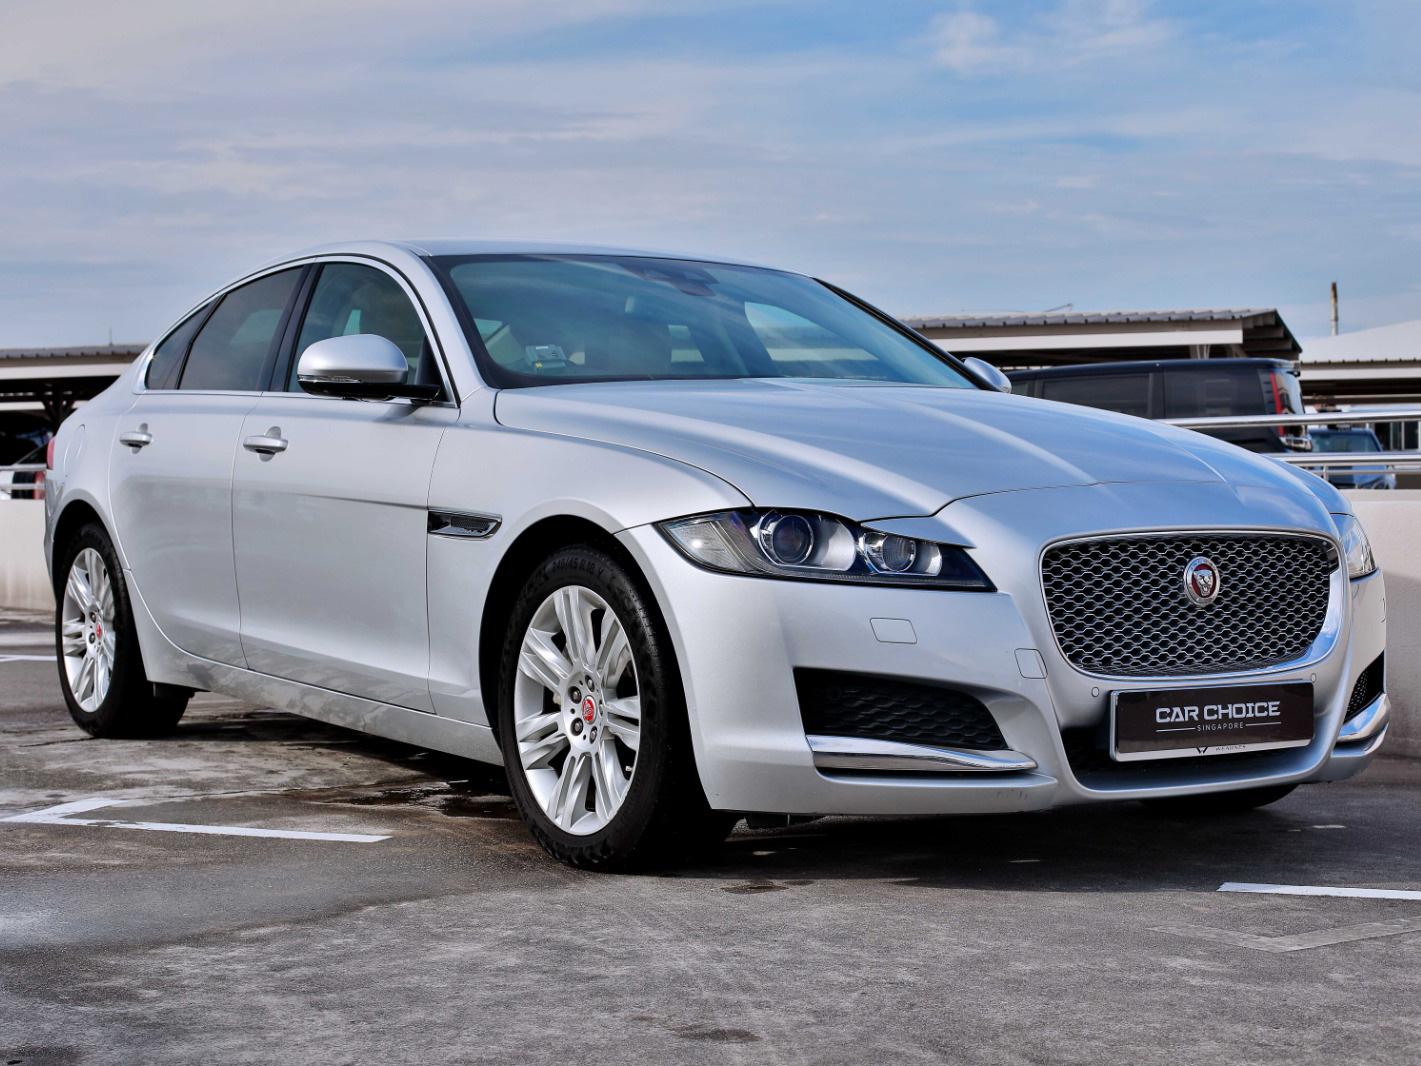 Jaguar XF 2.0A Prestige (For Lease)